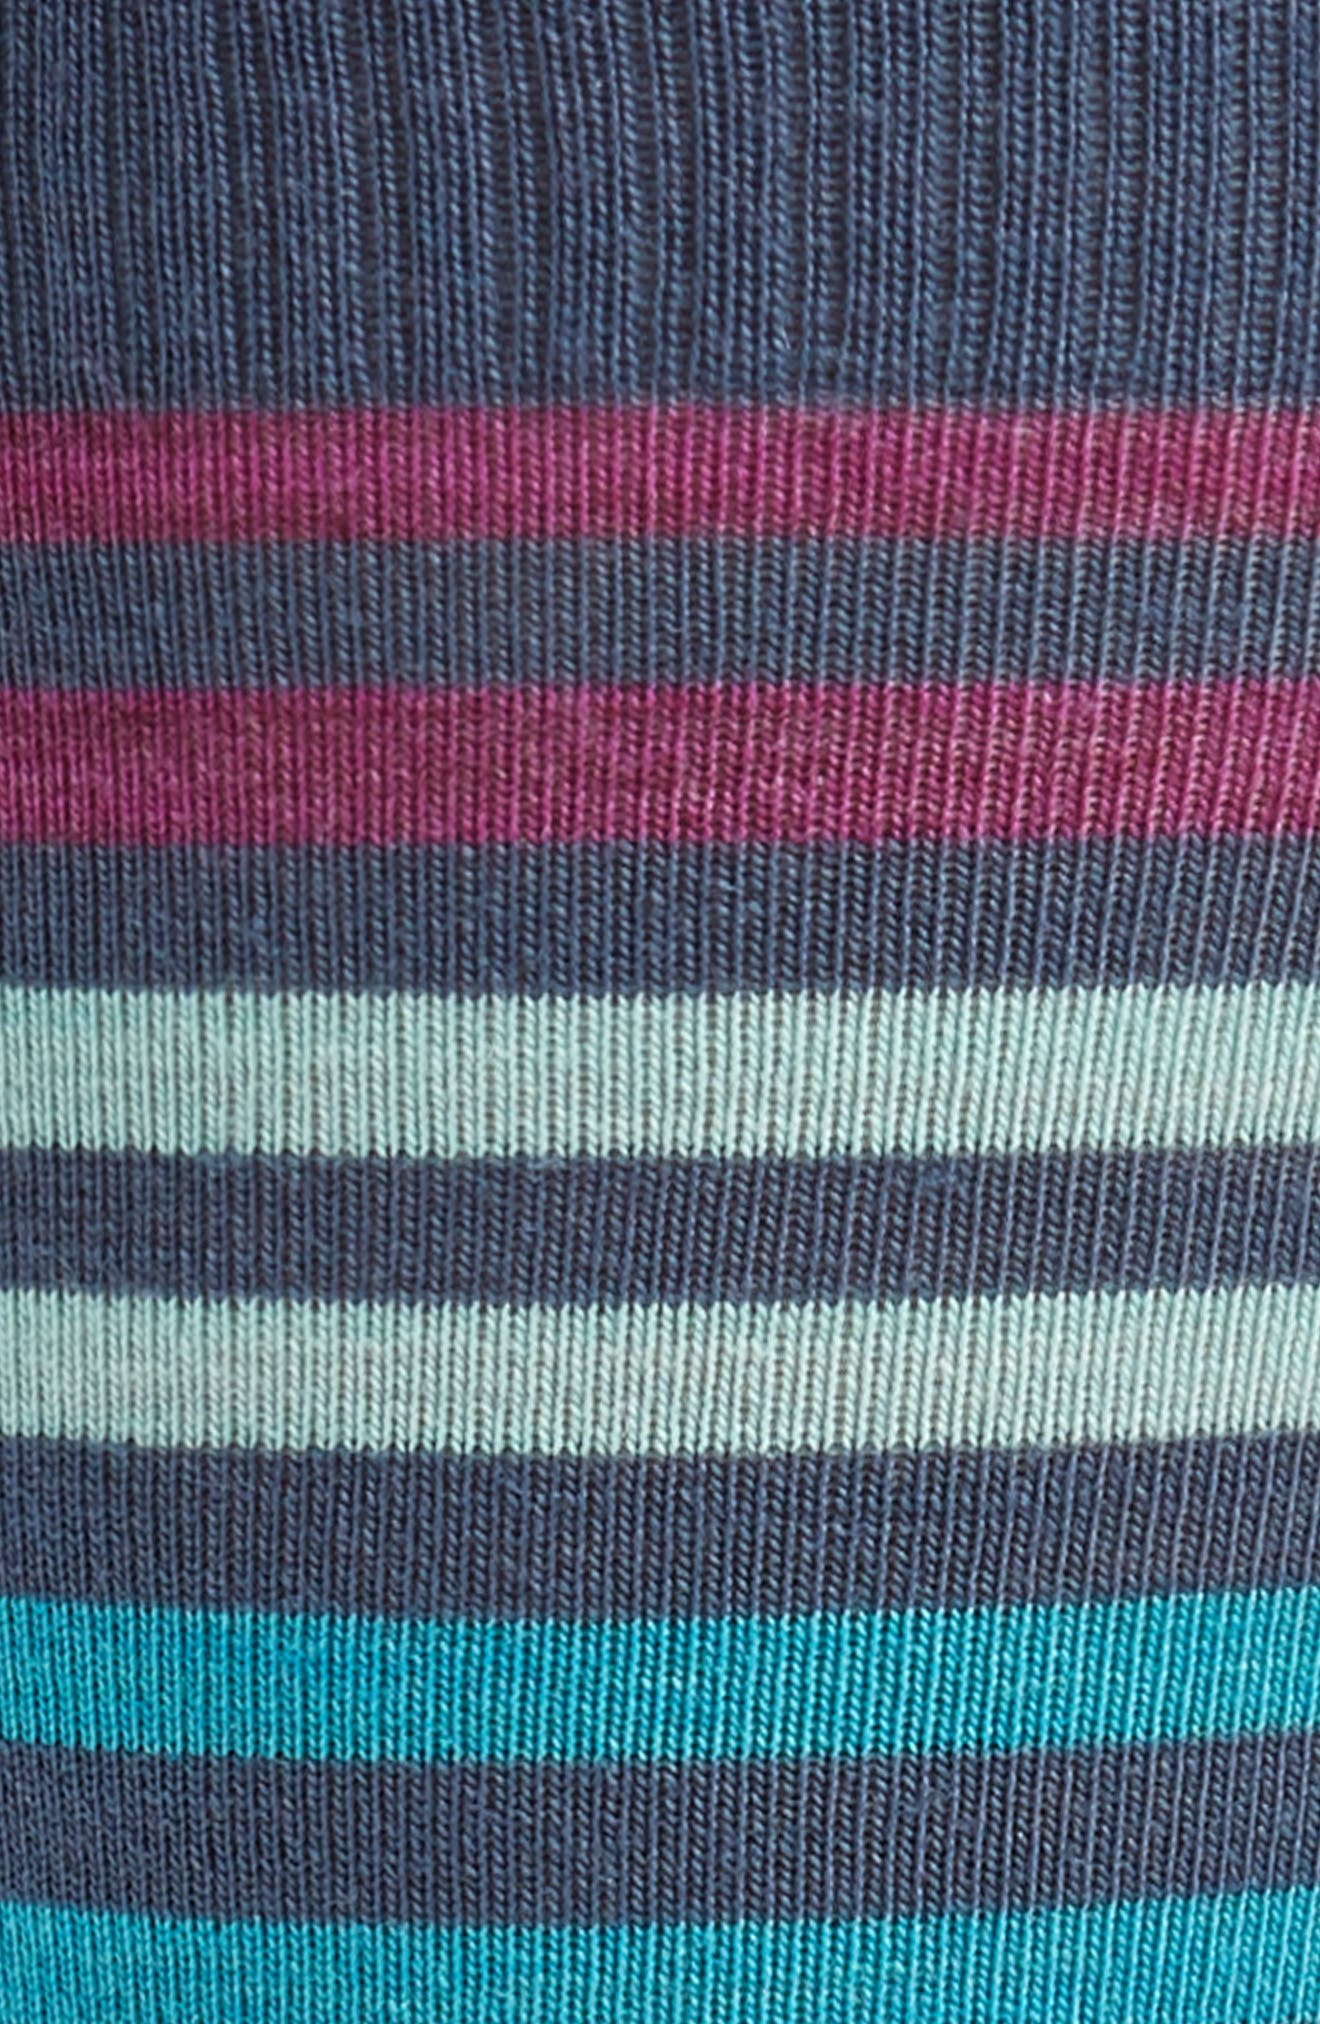 SMARTWOOL, 'Spruce Street' Stripe Merino Wool Blend Socks, Alternate thumbnail 2, color, DARK BLUE STEEL HEATHER